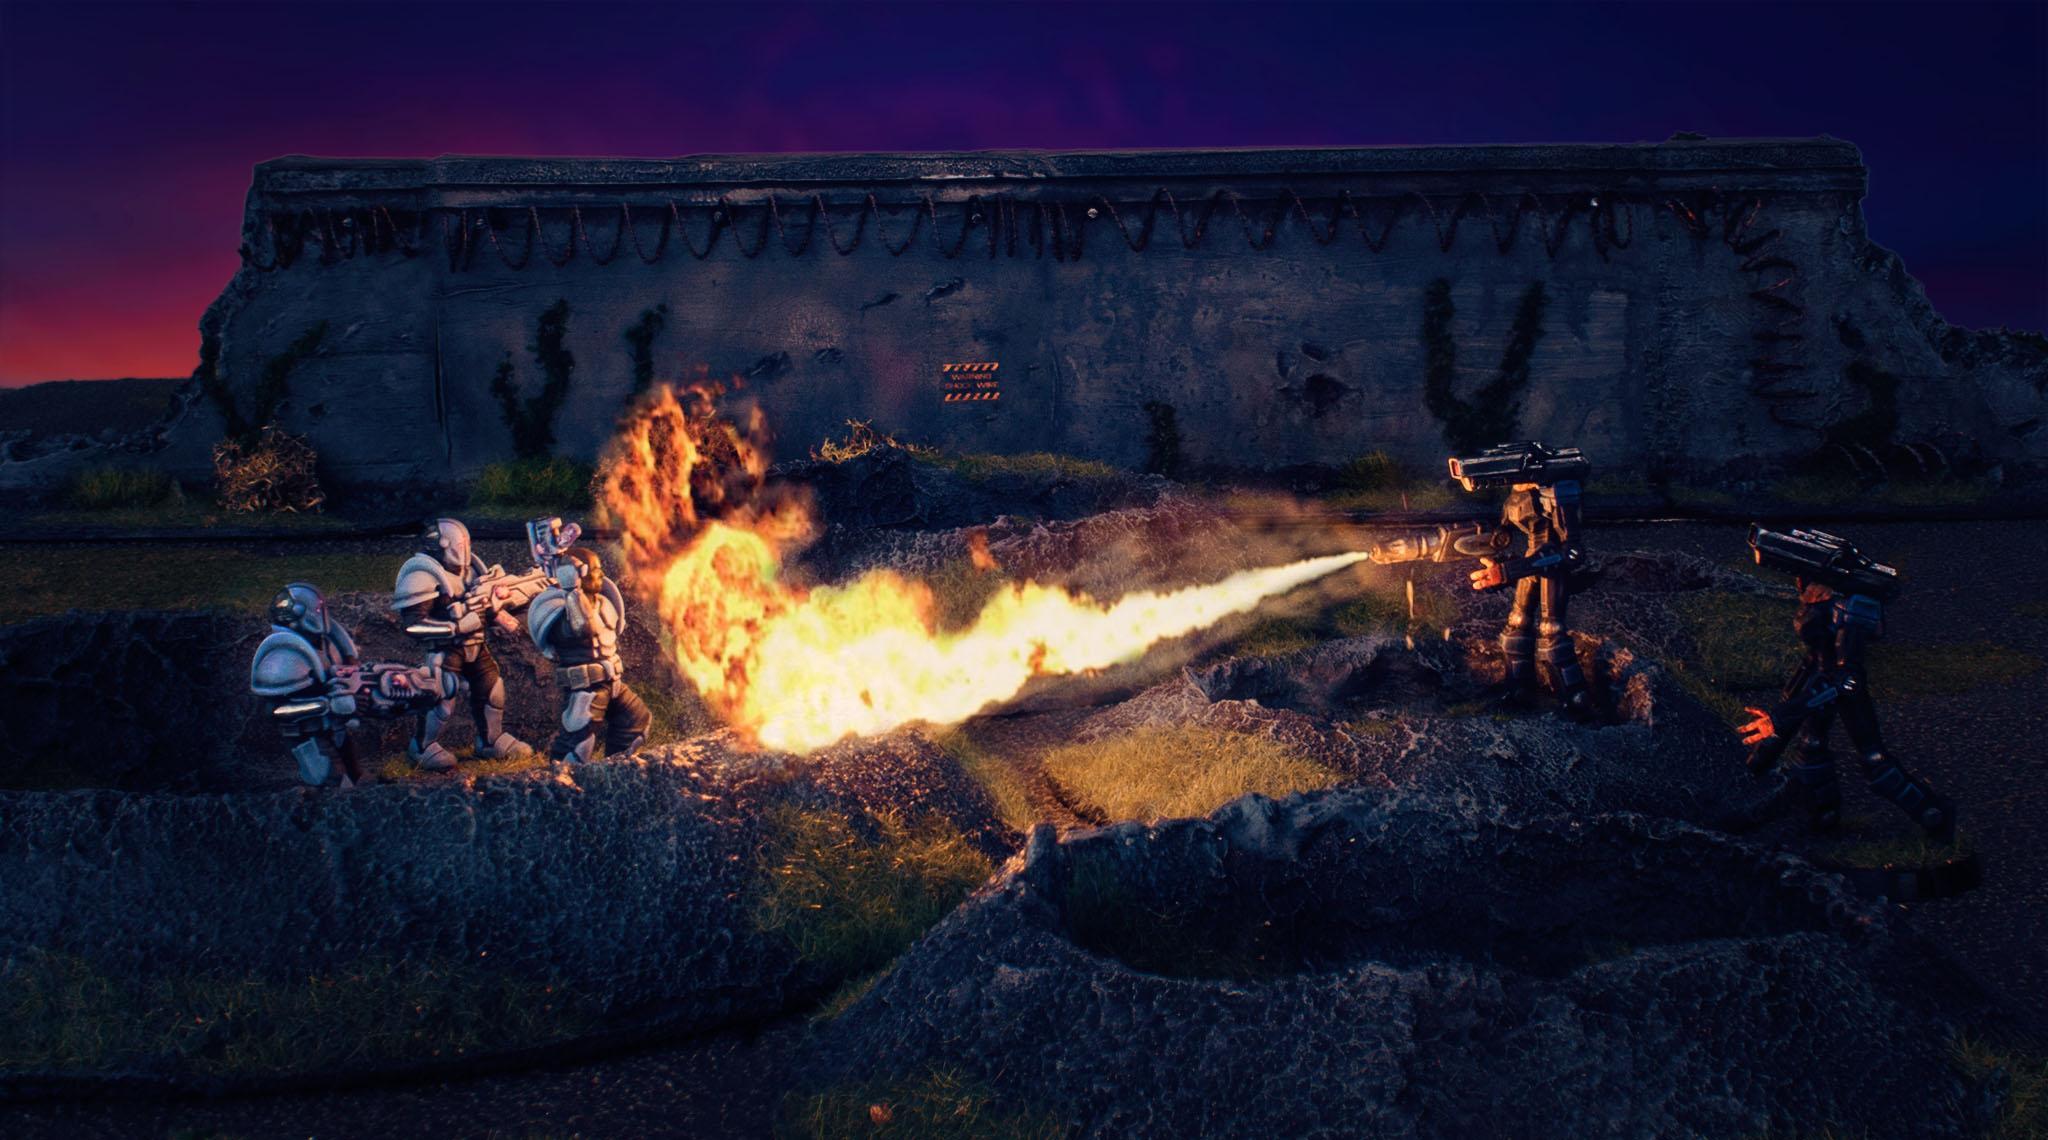 Bots, Craters, Epirian, Karist Troopers, Maelstrom's Edge, Scarecrow, Terrain